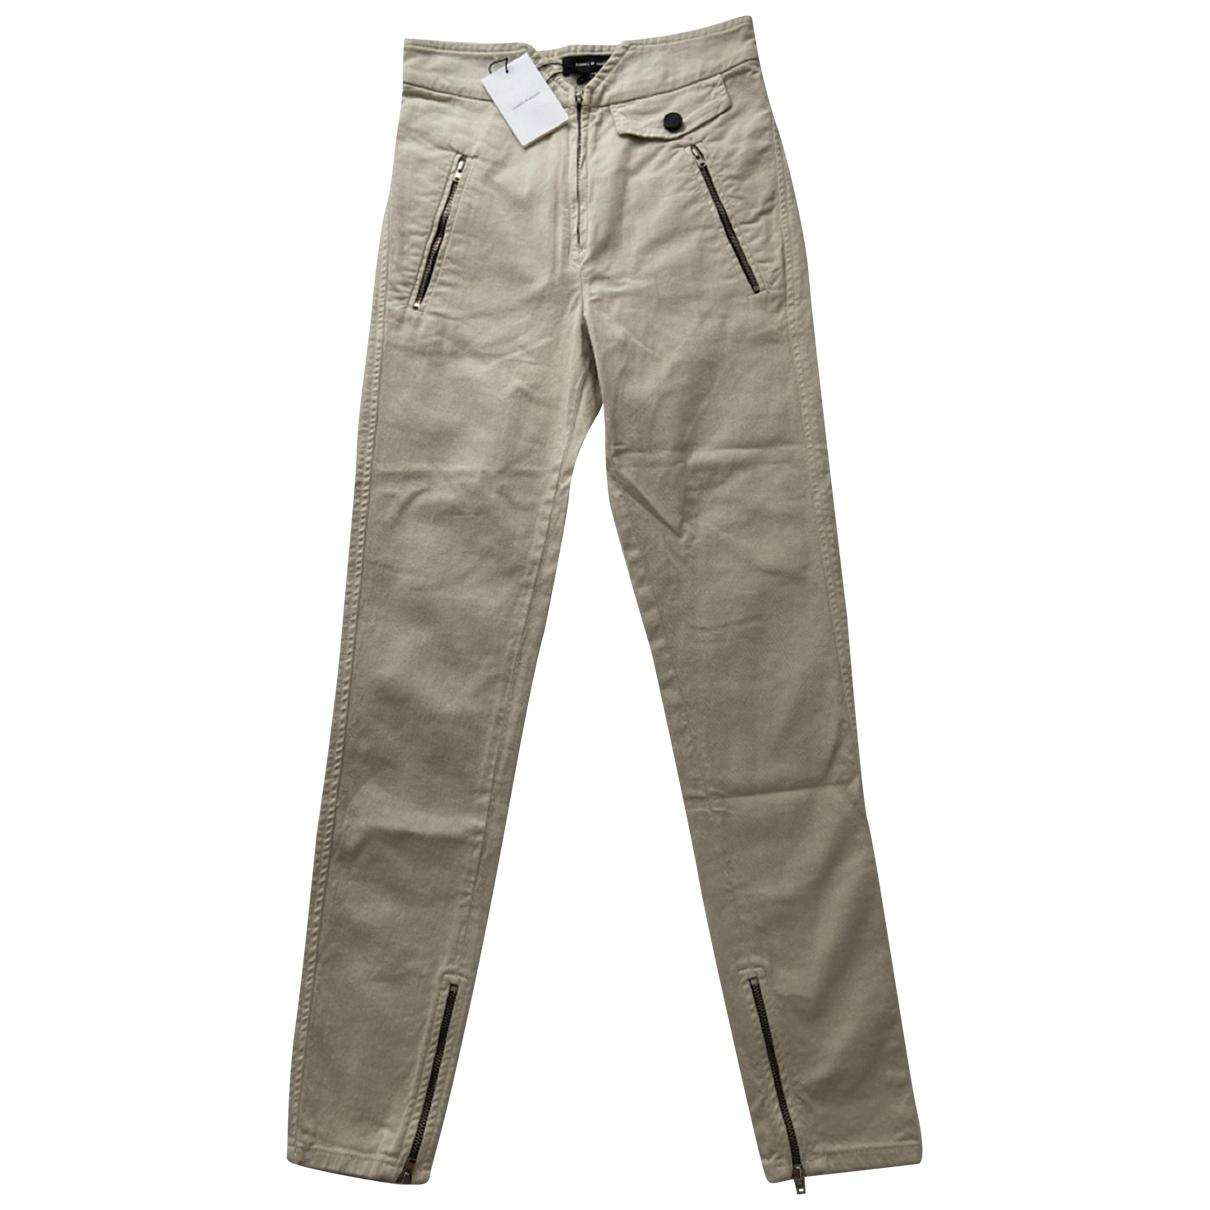 Isabel Marant \N Beige Cotton Trousers for Women 34 FR